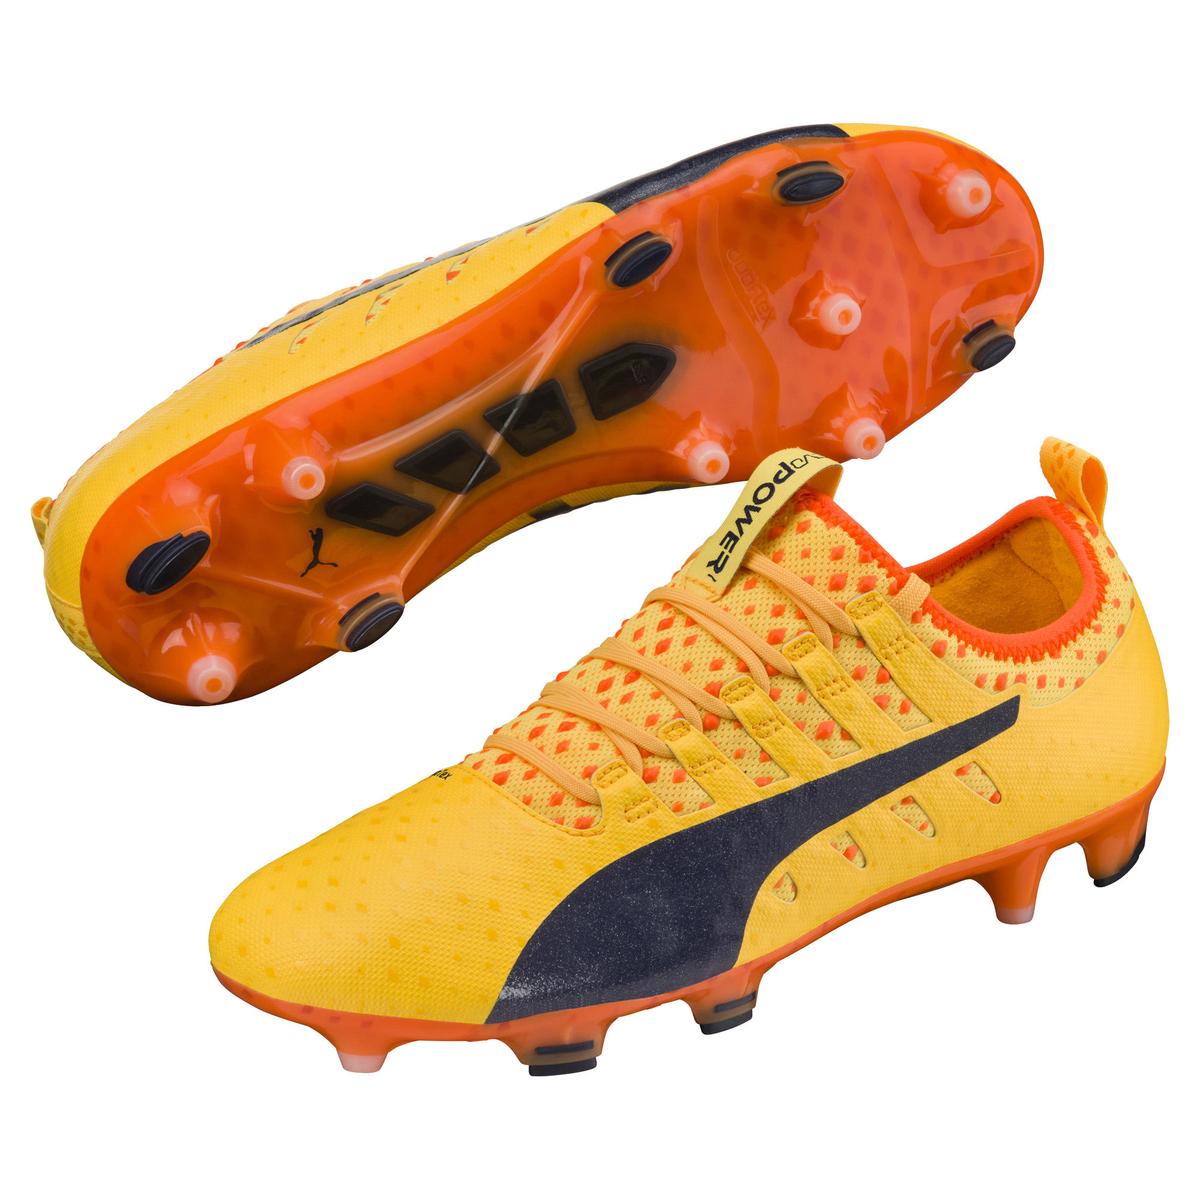 new product e1228 56f62 puma evopower vigor 1 fg q2 17 fotbollssko senior fotbollsskor